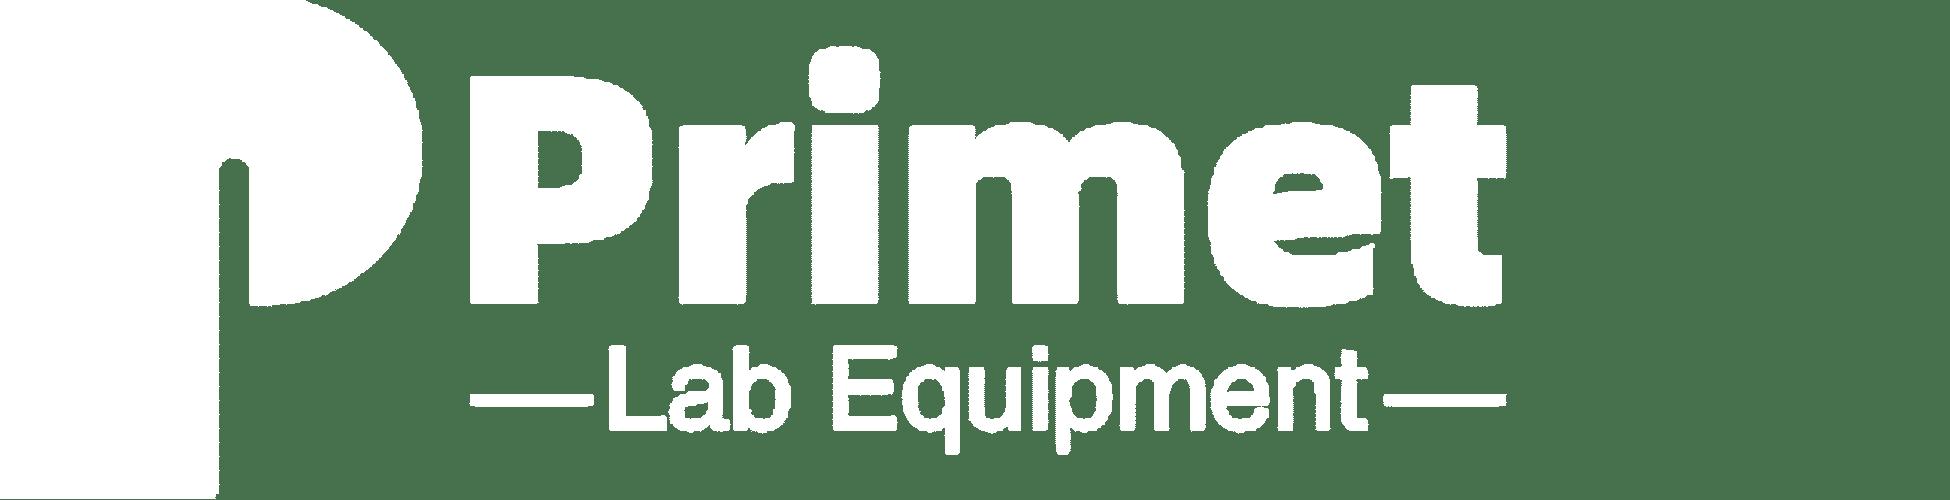 Primet Lab Ball Mill, Acrylic Glovebox, Battery Consummables